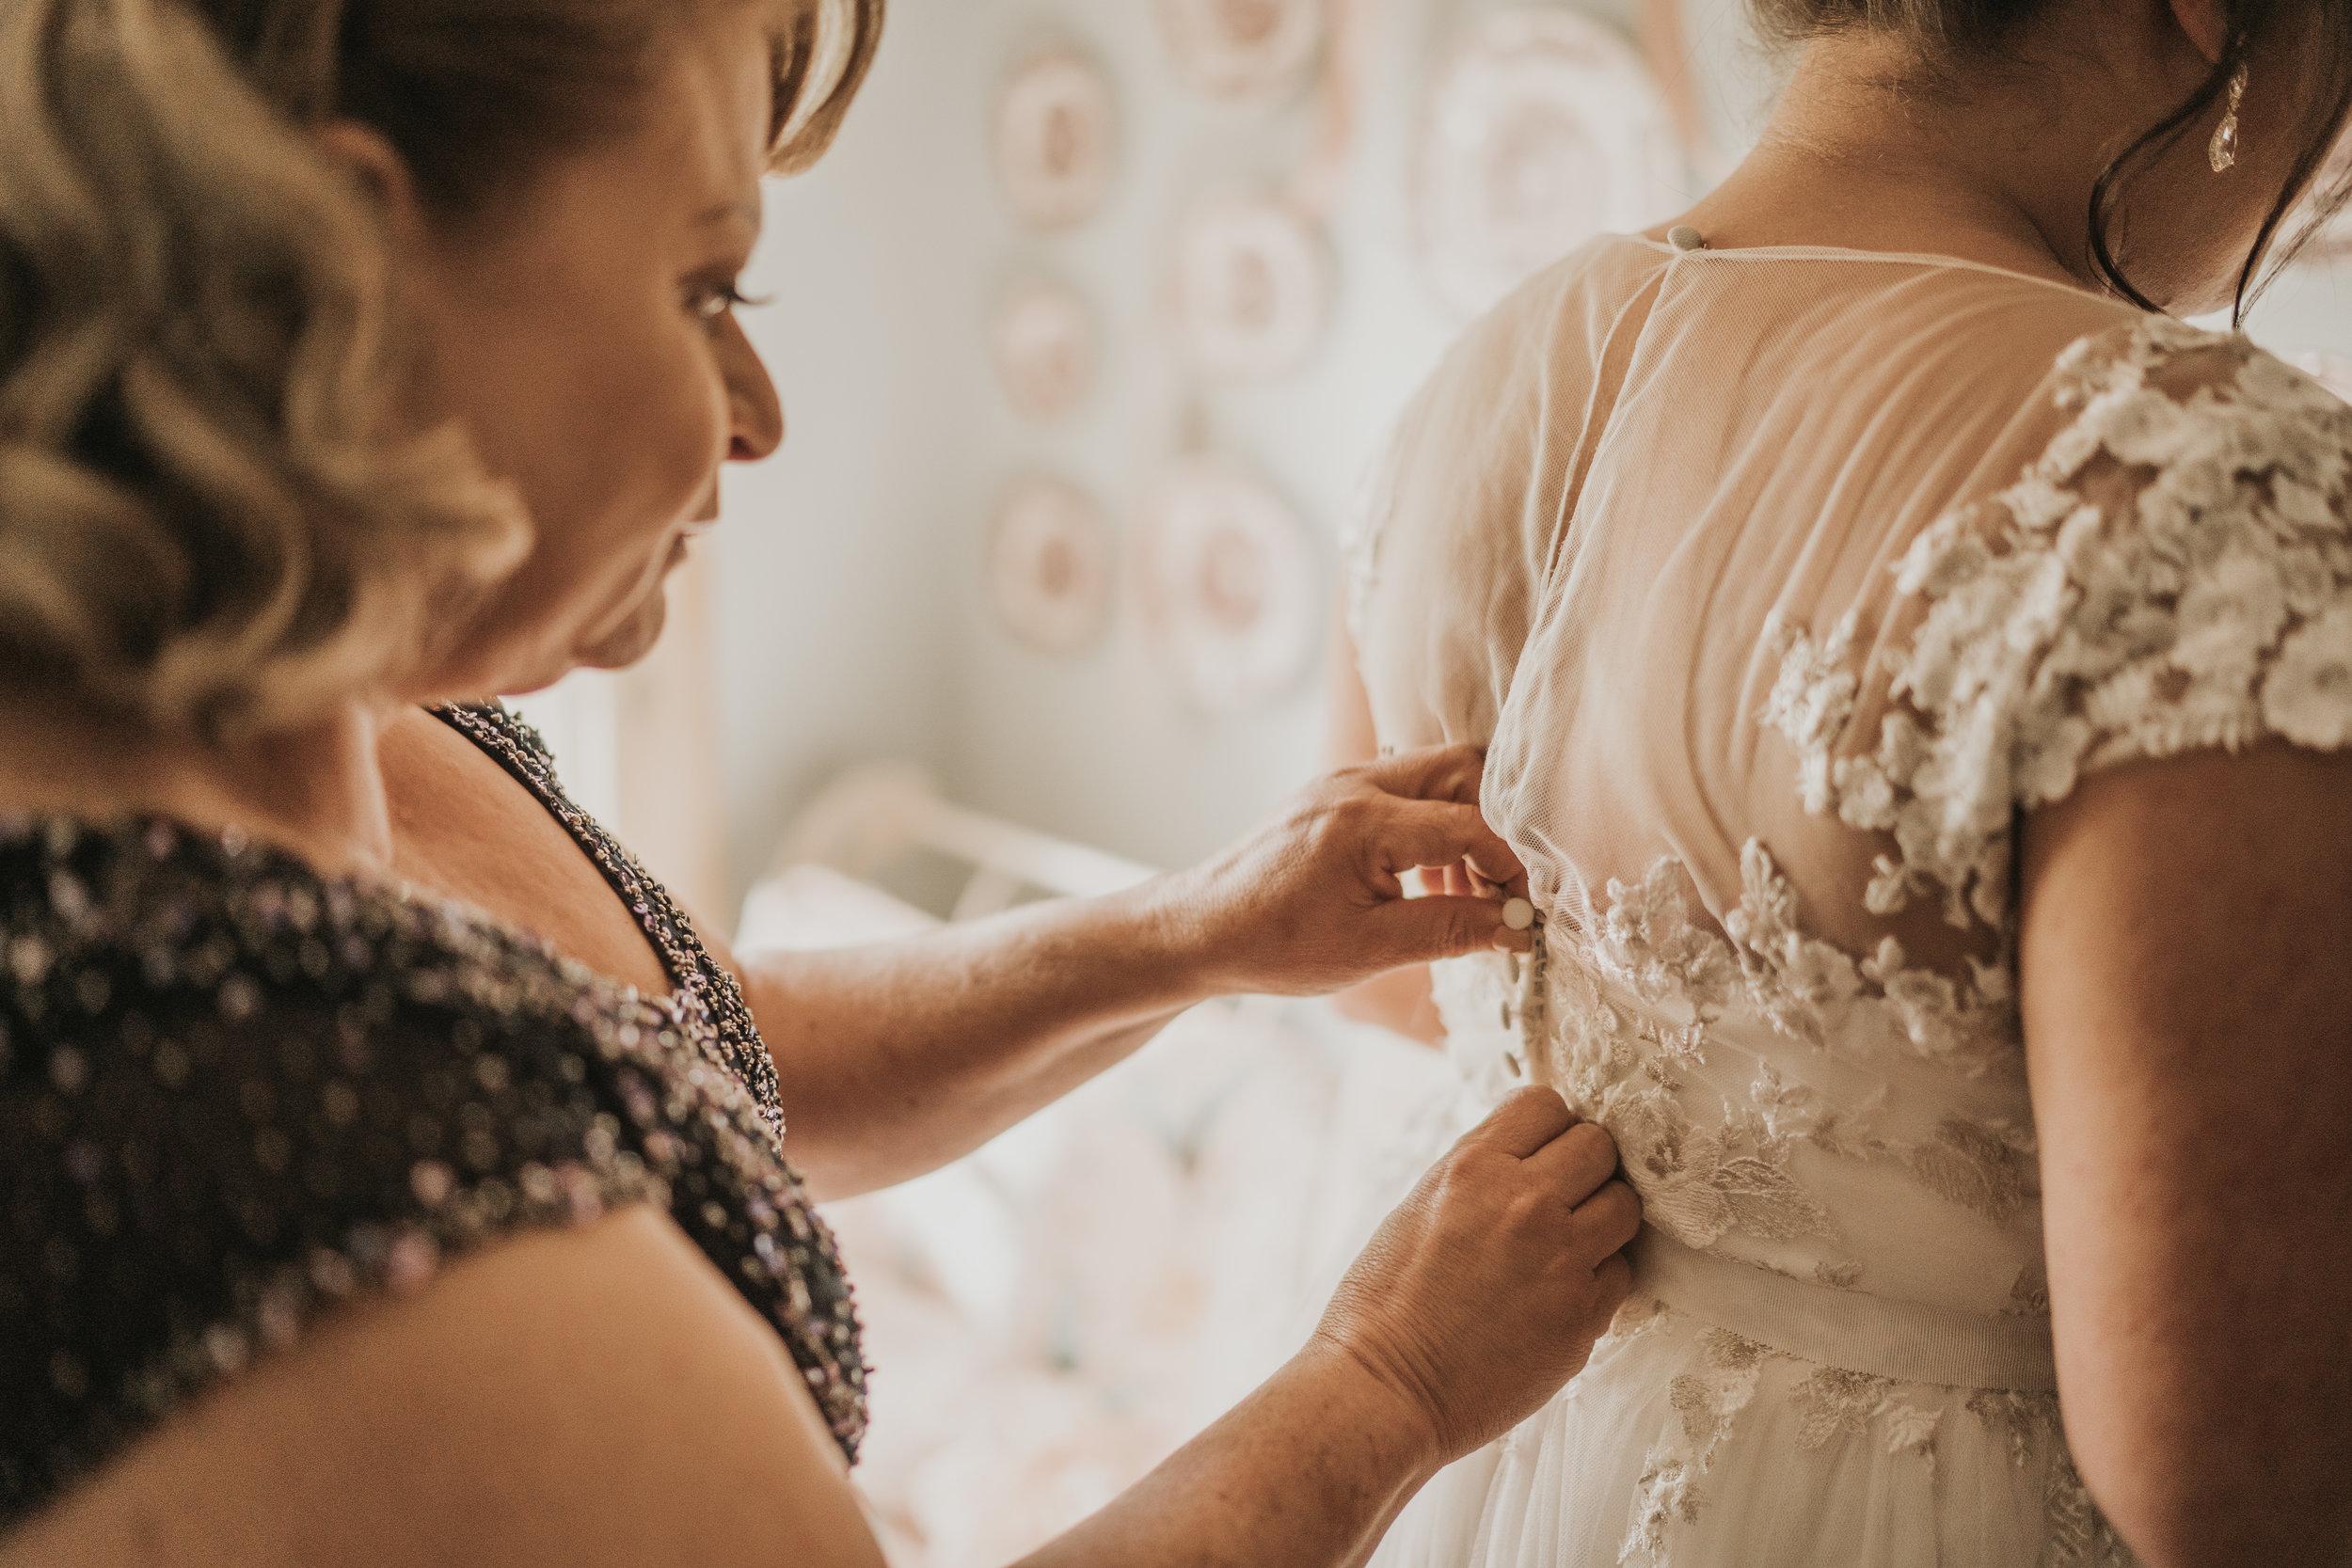 178MICHI&GABEWEDDINGDAY(WeddingFinal).jpg